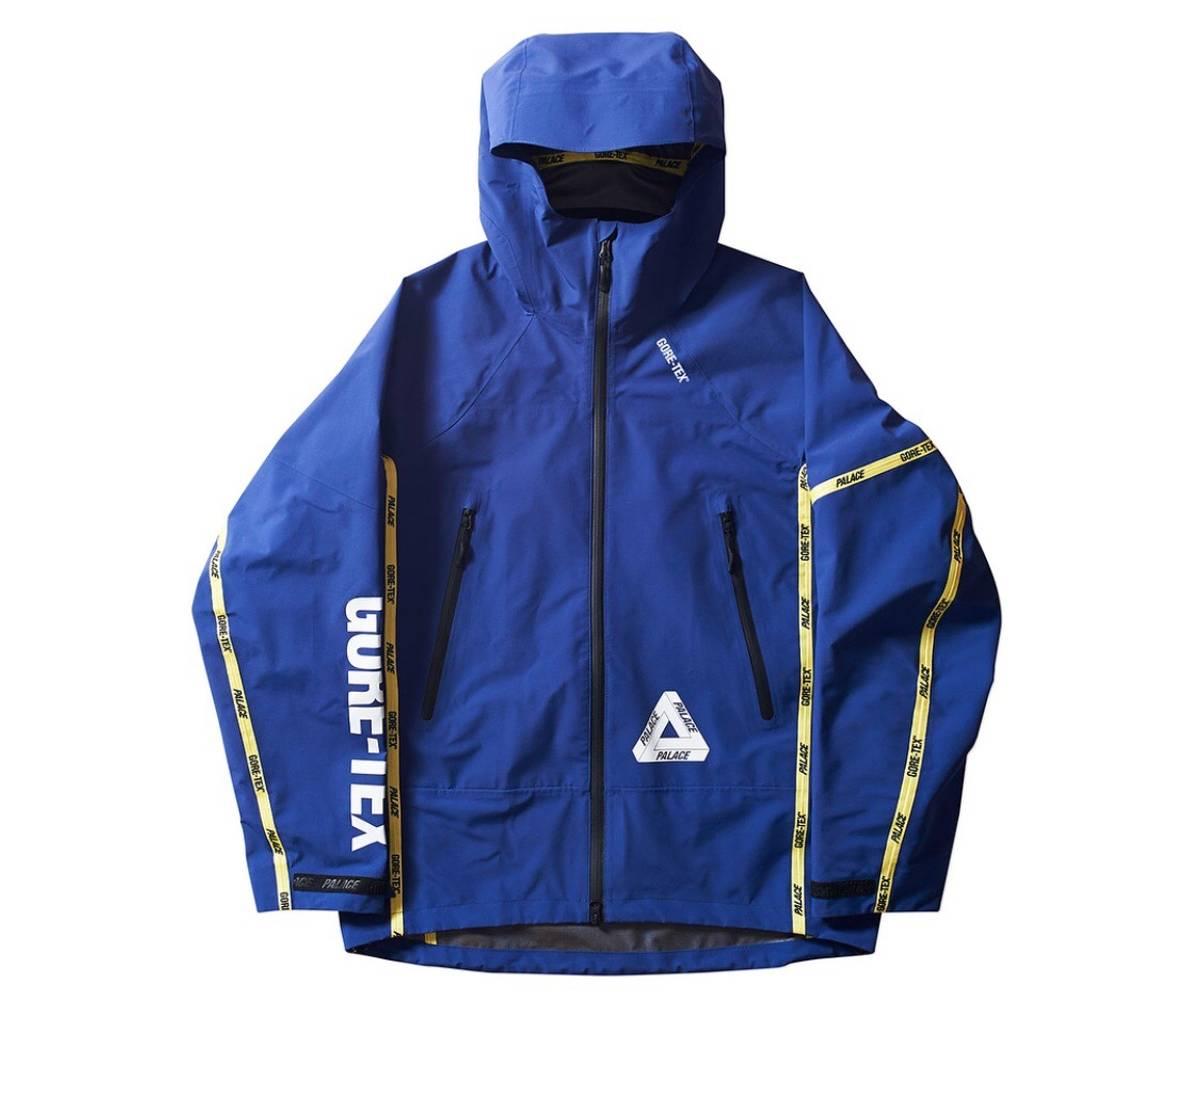 7051614c413a Palace Palace Gore Tex Jacket Blue Size s - Parkas for Sale - Grailed